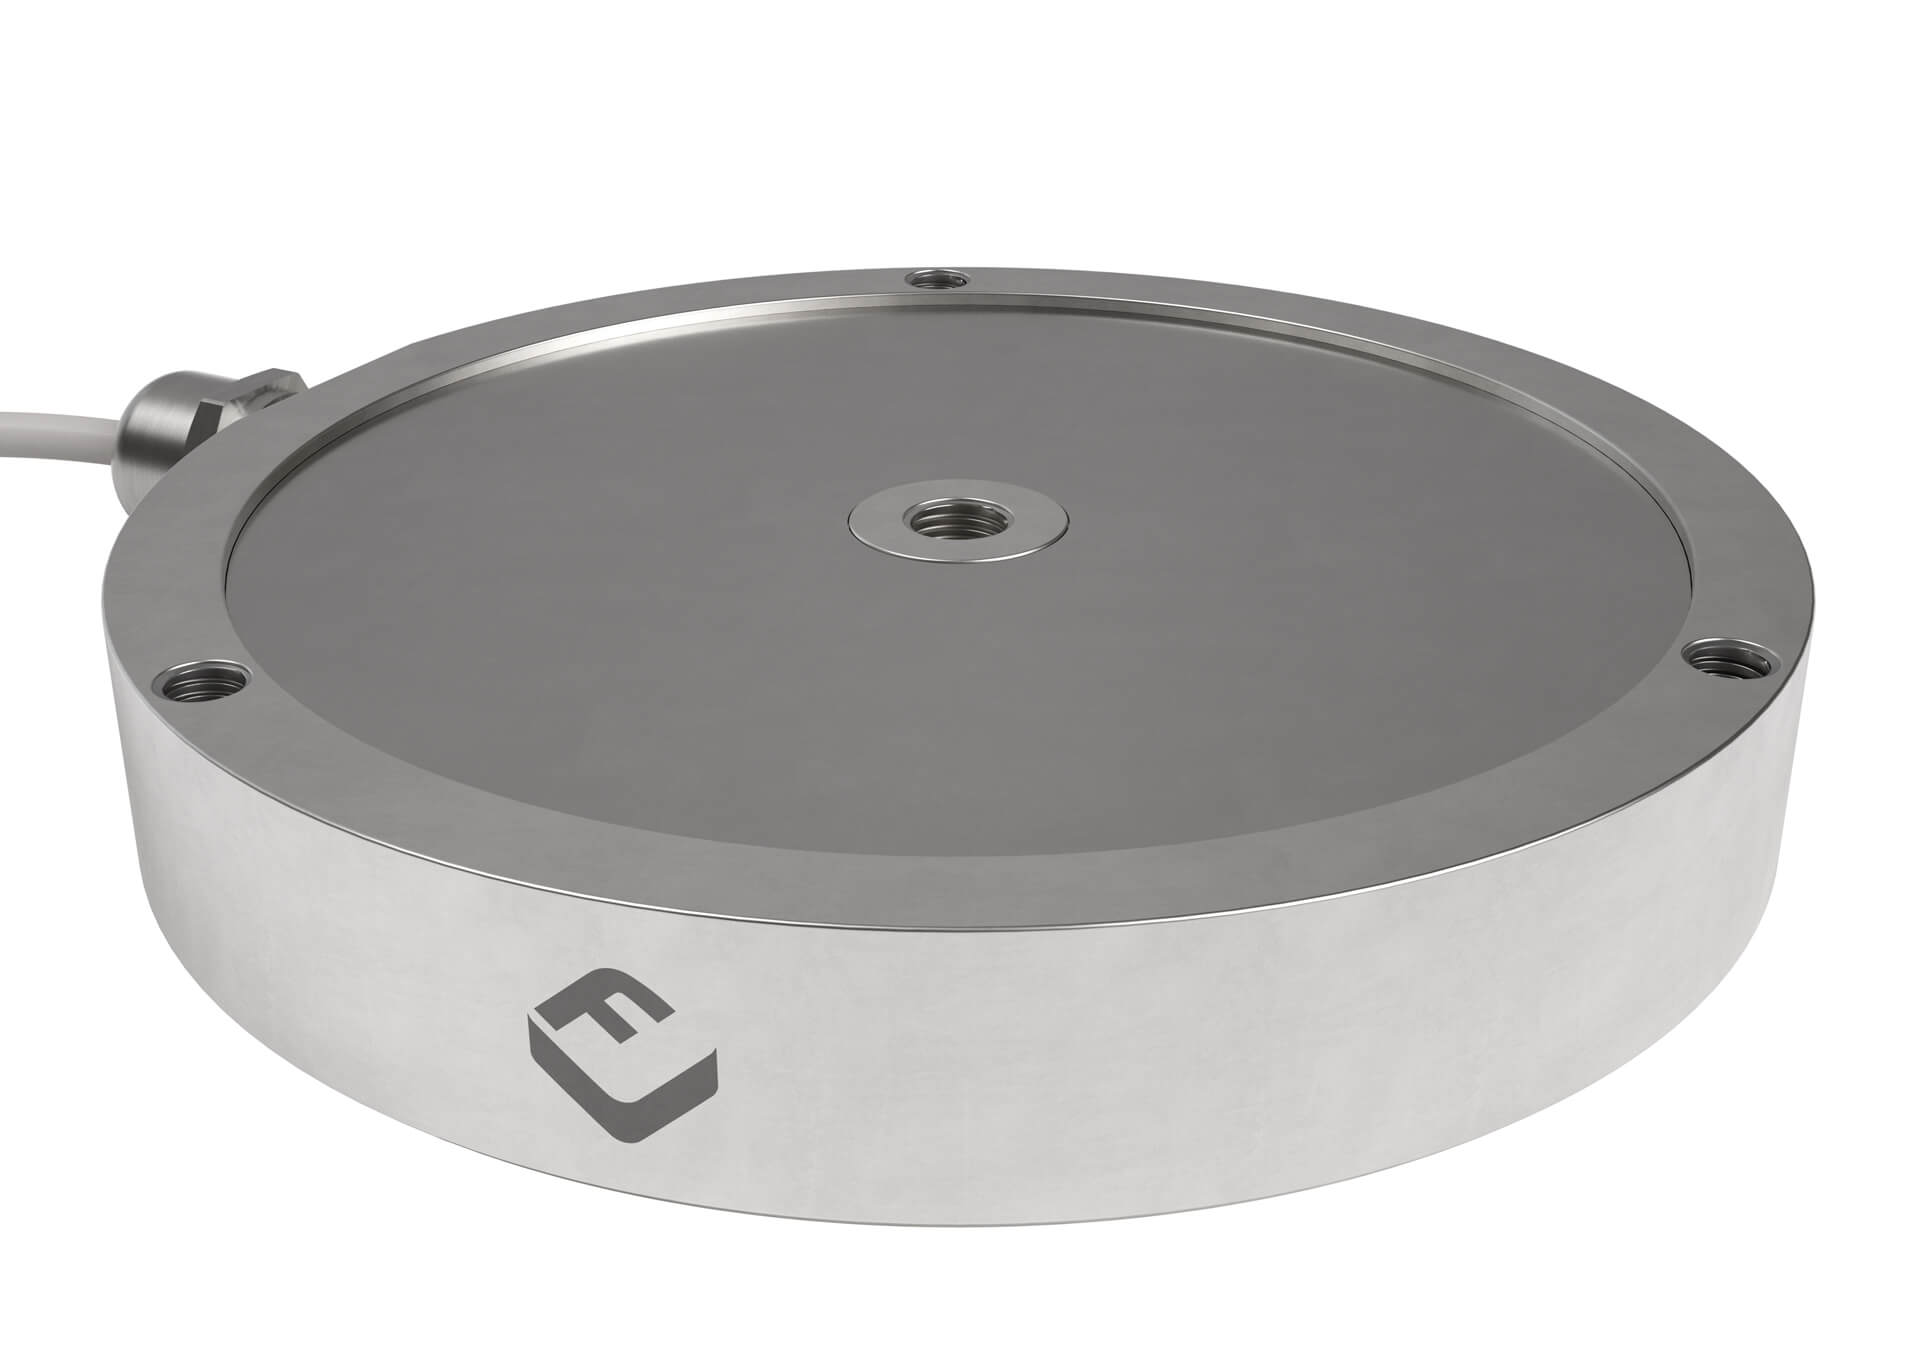 AP5 low profile force sensor (1 - 10kg) Image